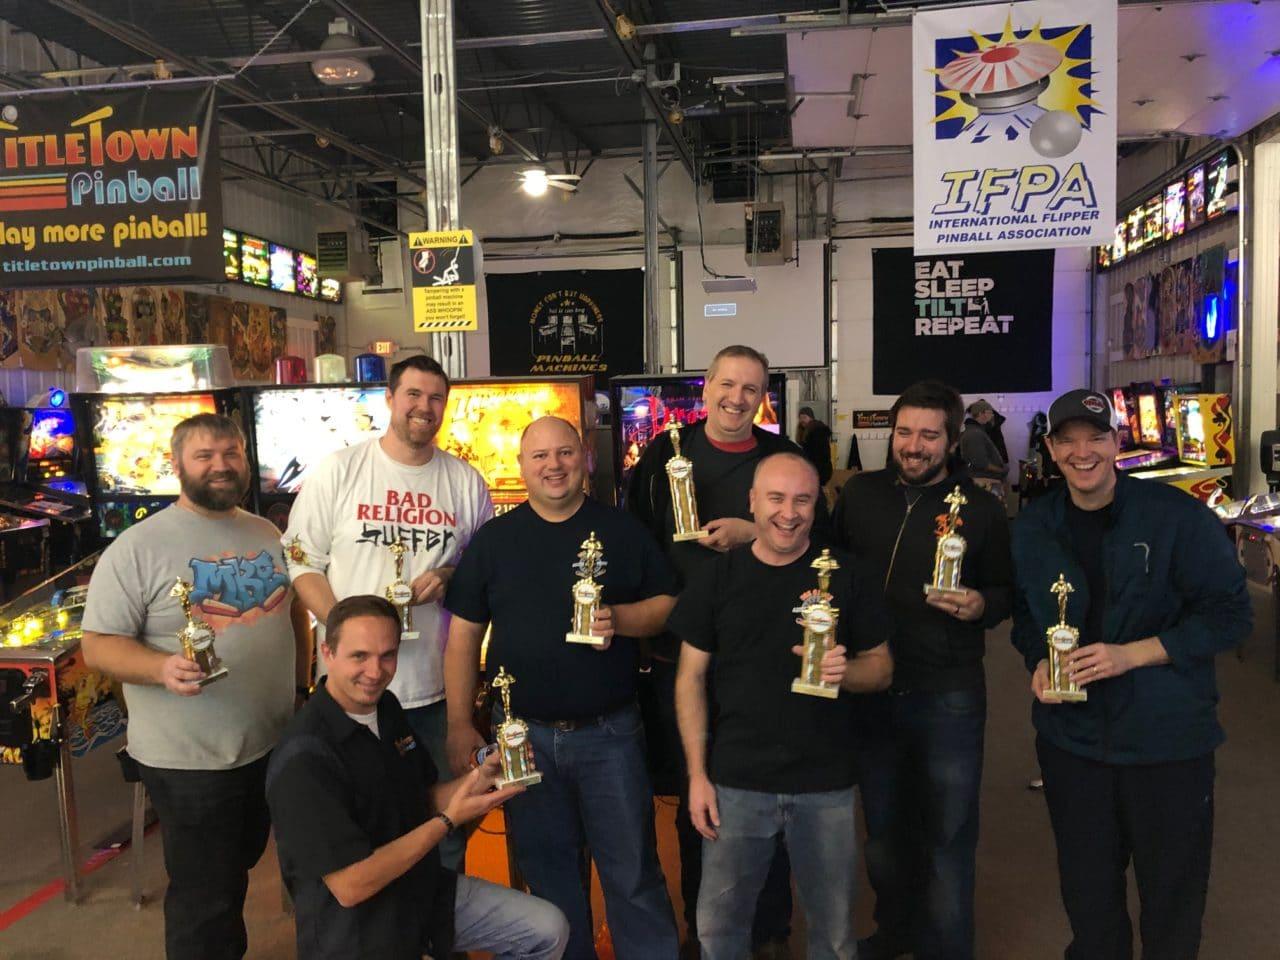 November 2019 Match Play Pinball Tournament in Green Bay, WI